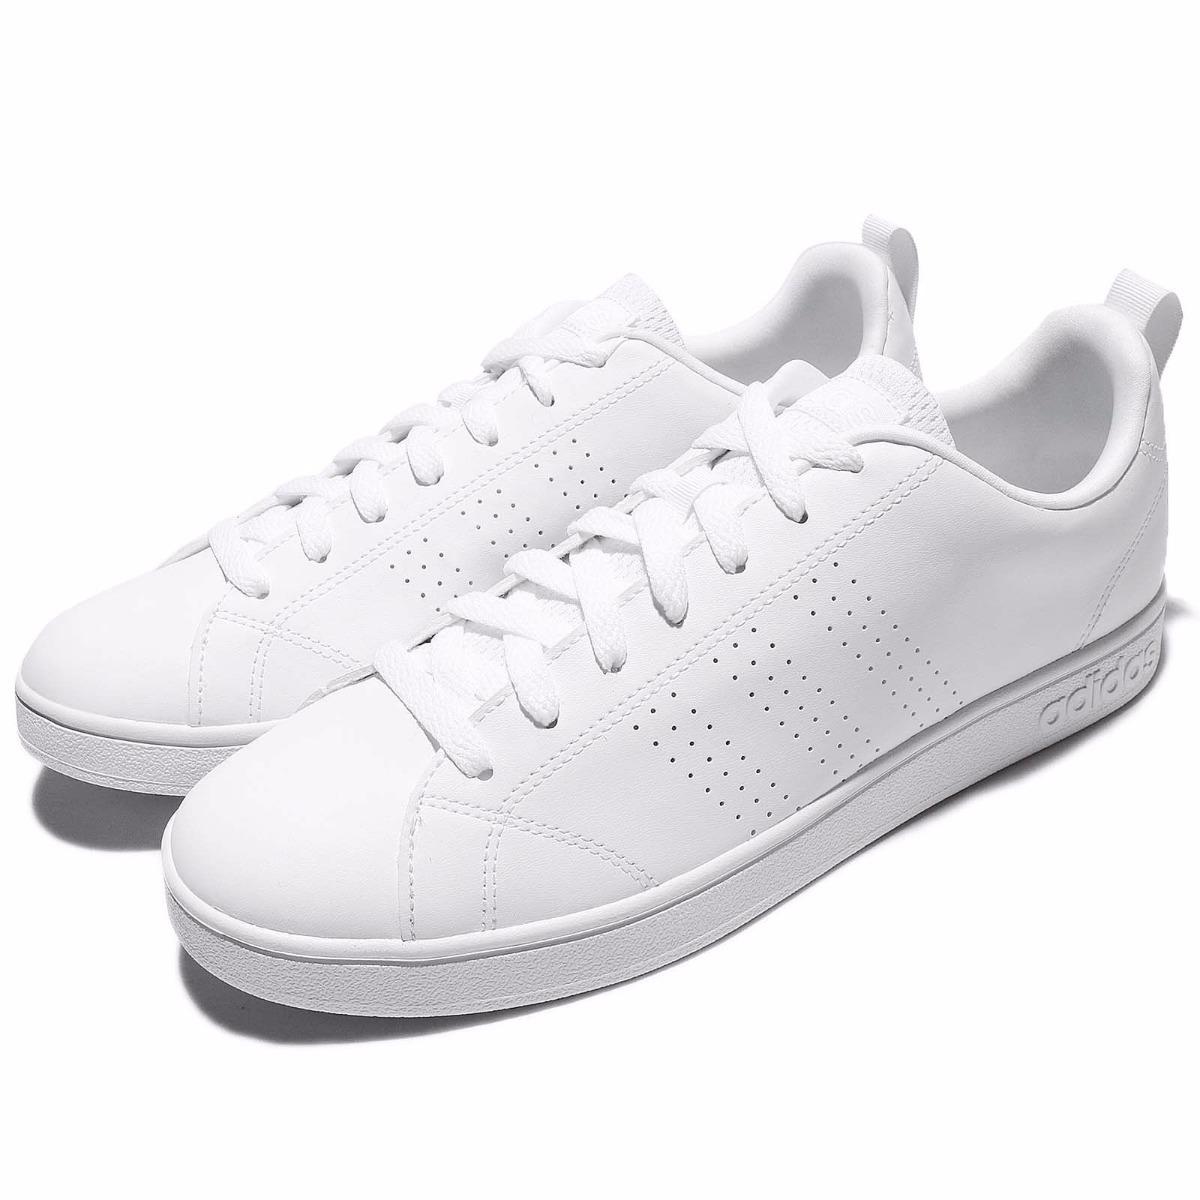 Tenis adidas Neo Casual Caballeroadvantage Cleanvs Original